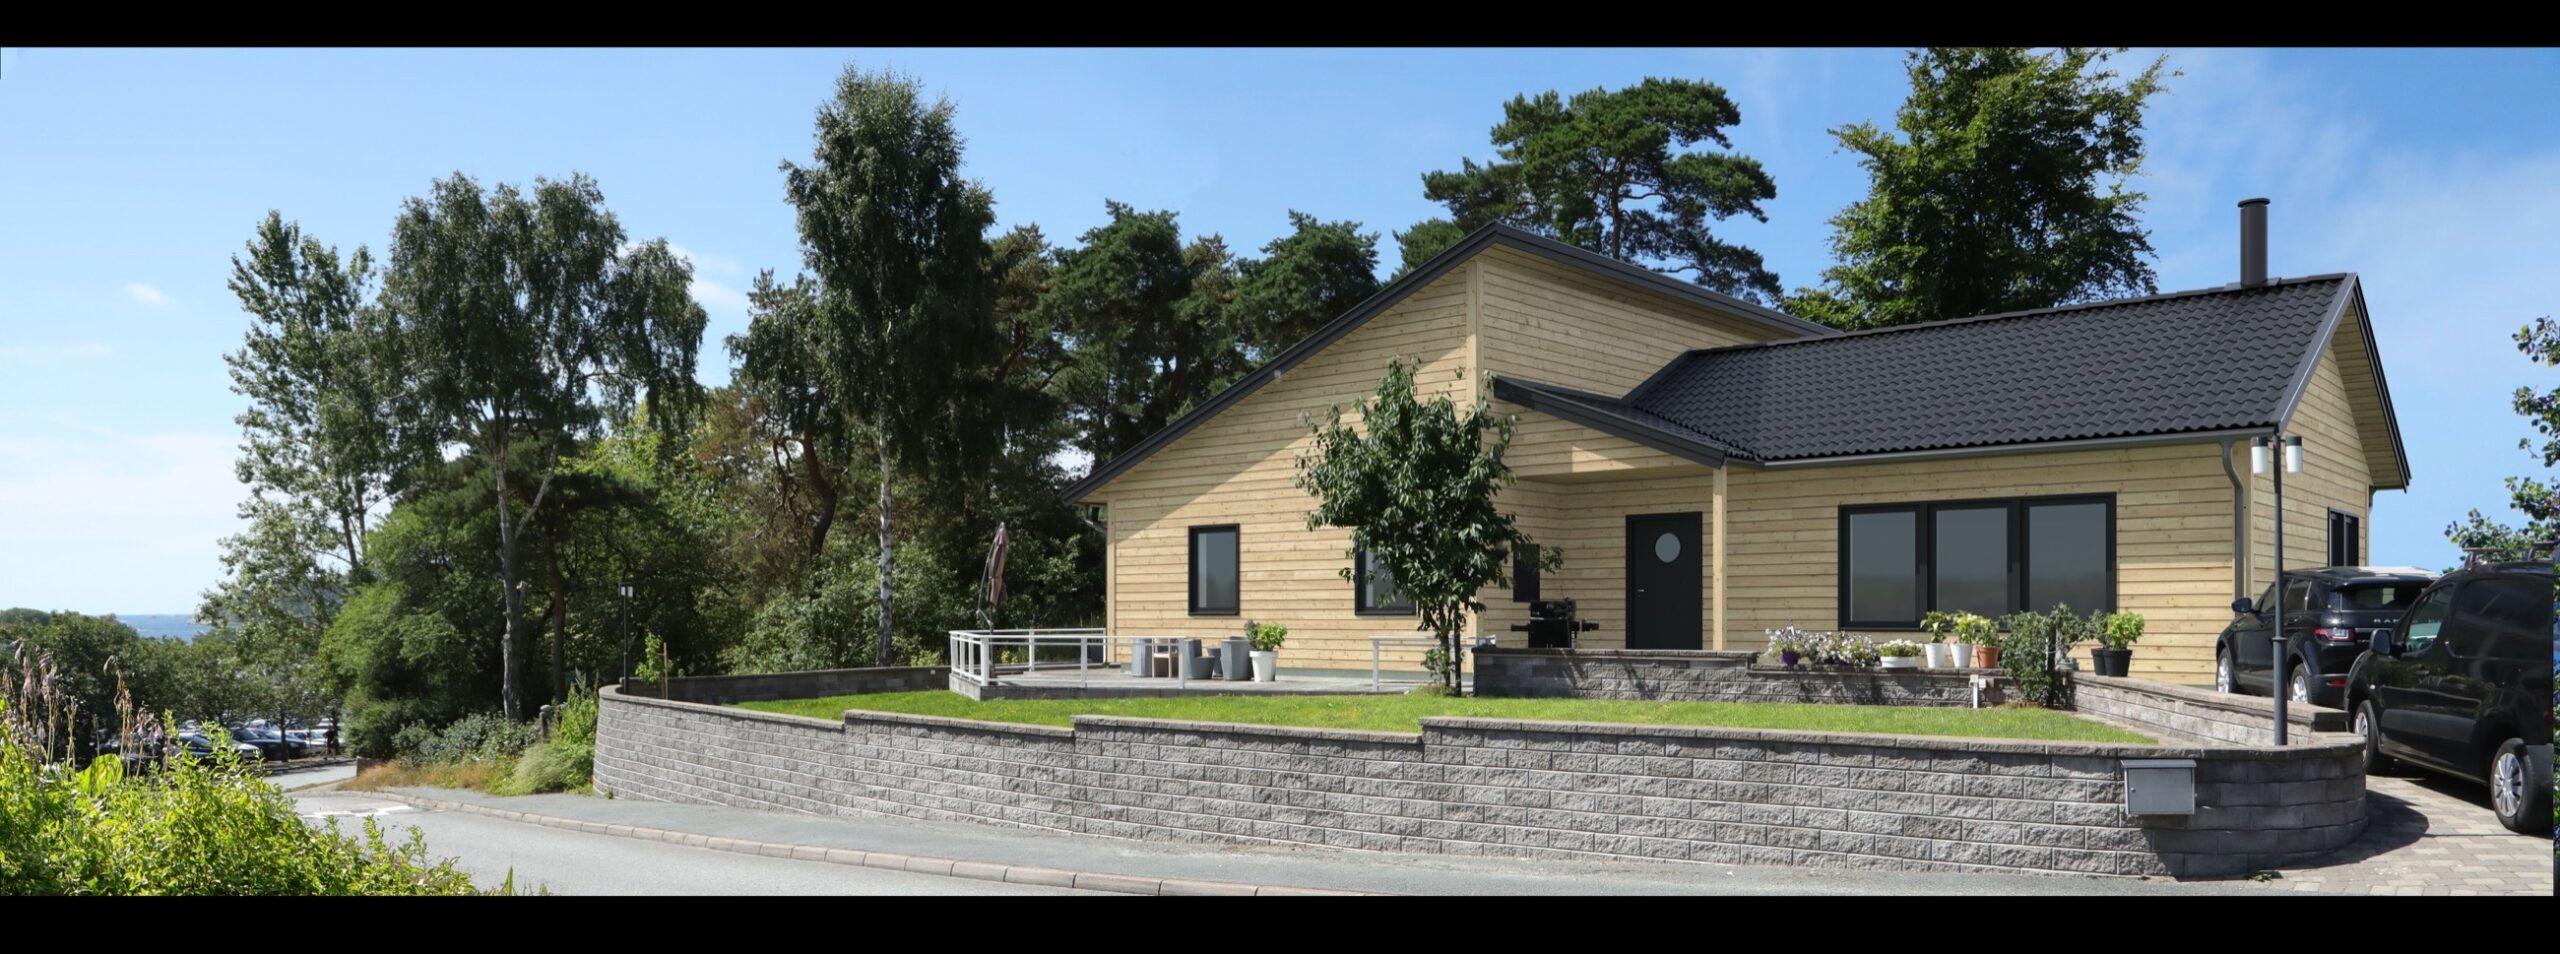 visualistering-natur-hus-panel-svart-tak